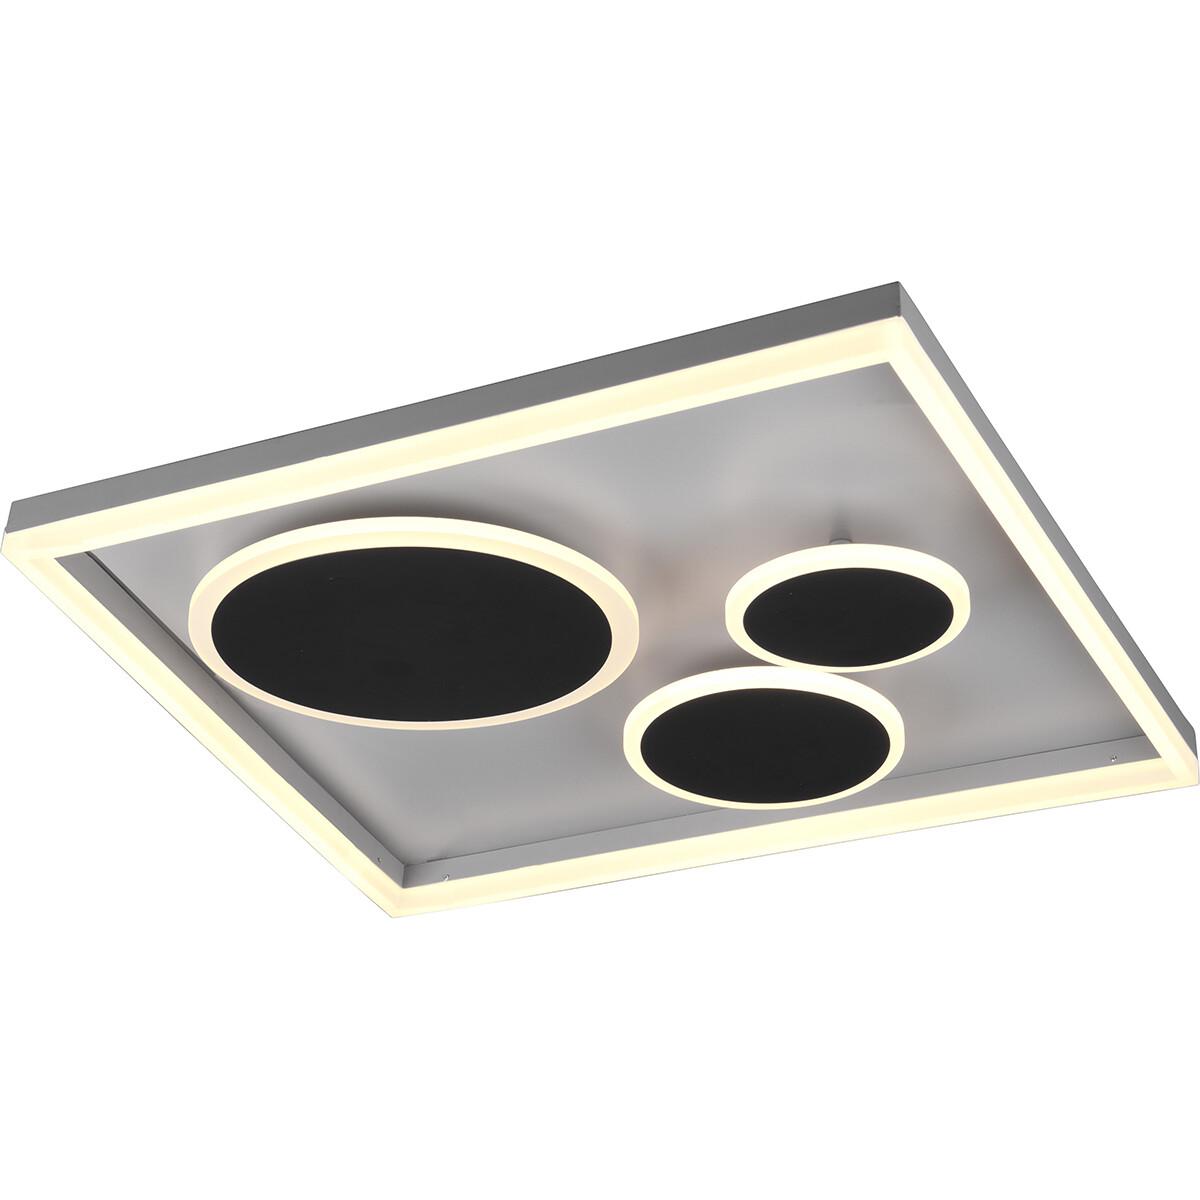 LED Plafondlamp - Plafondverlichting - Trion Horry - 45W - Aanpasbare Kleur - Vierkant - Mat Zwart -